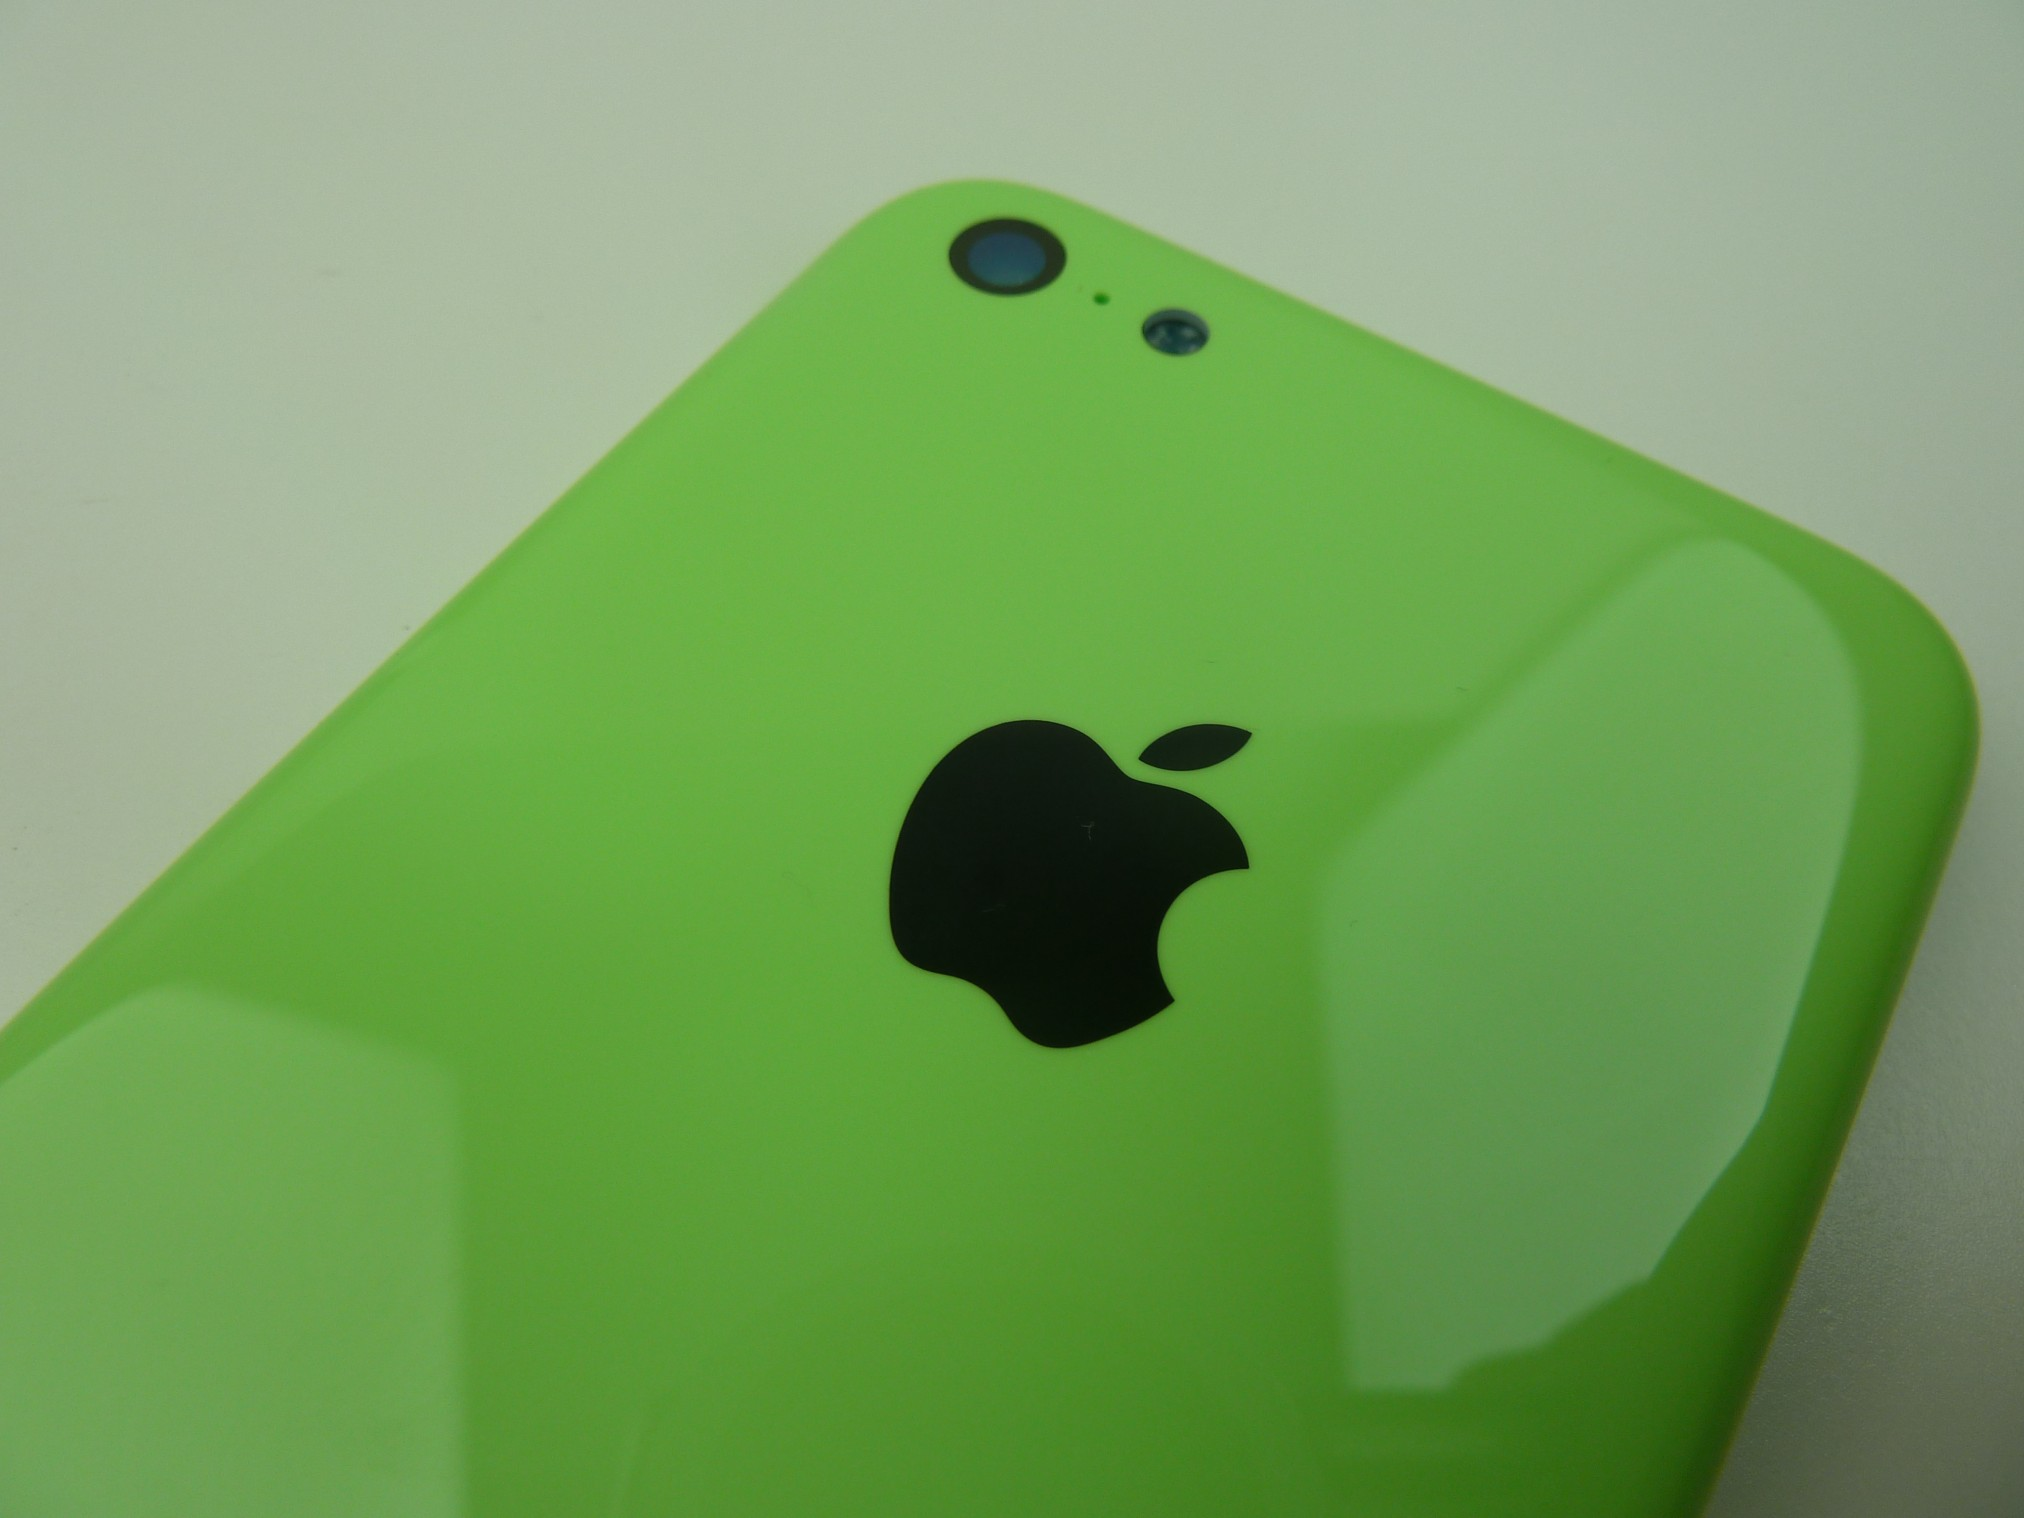 iPhone 5c สีเขียวอ่อน